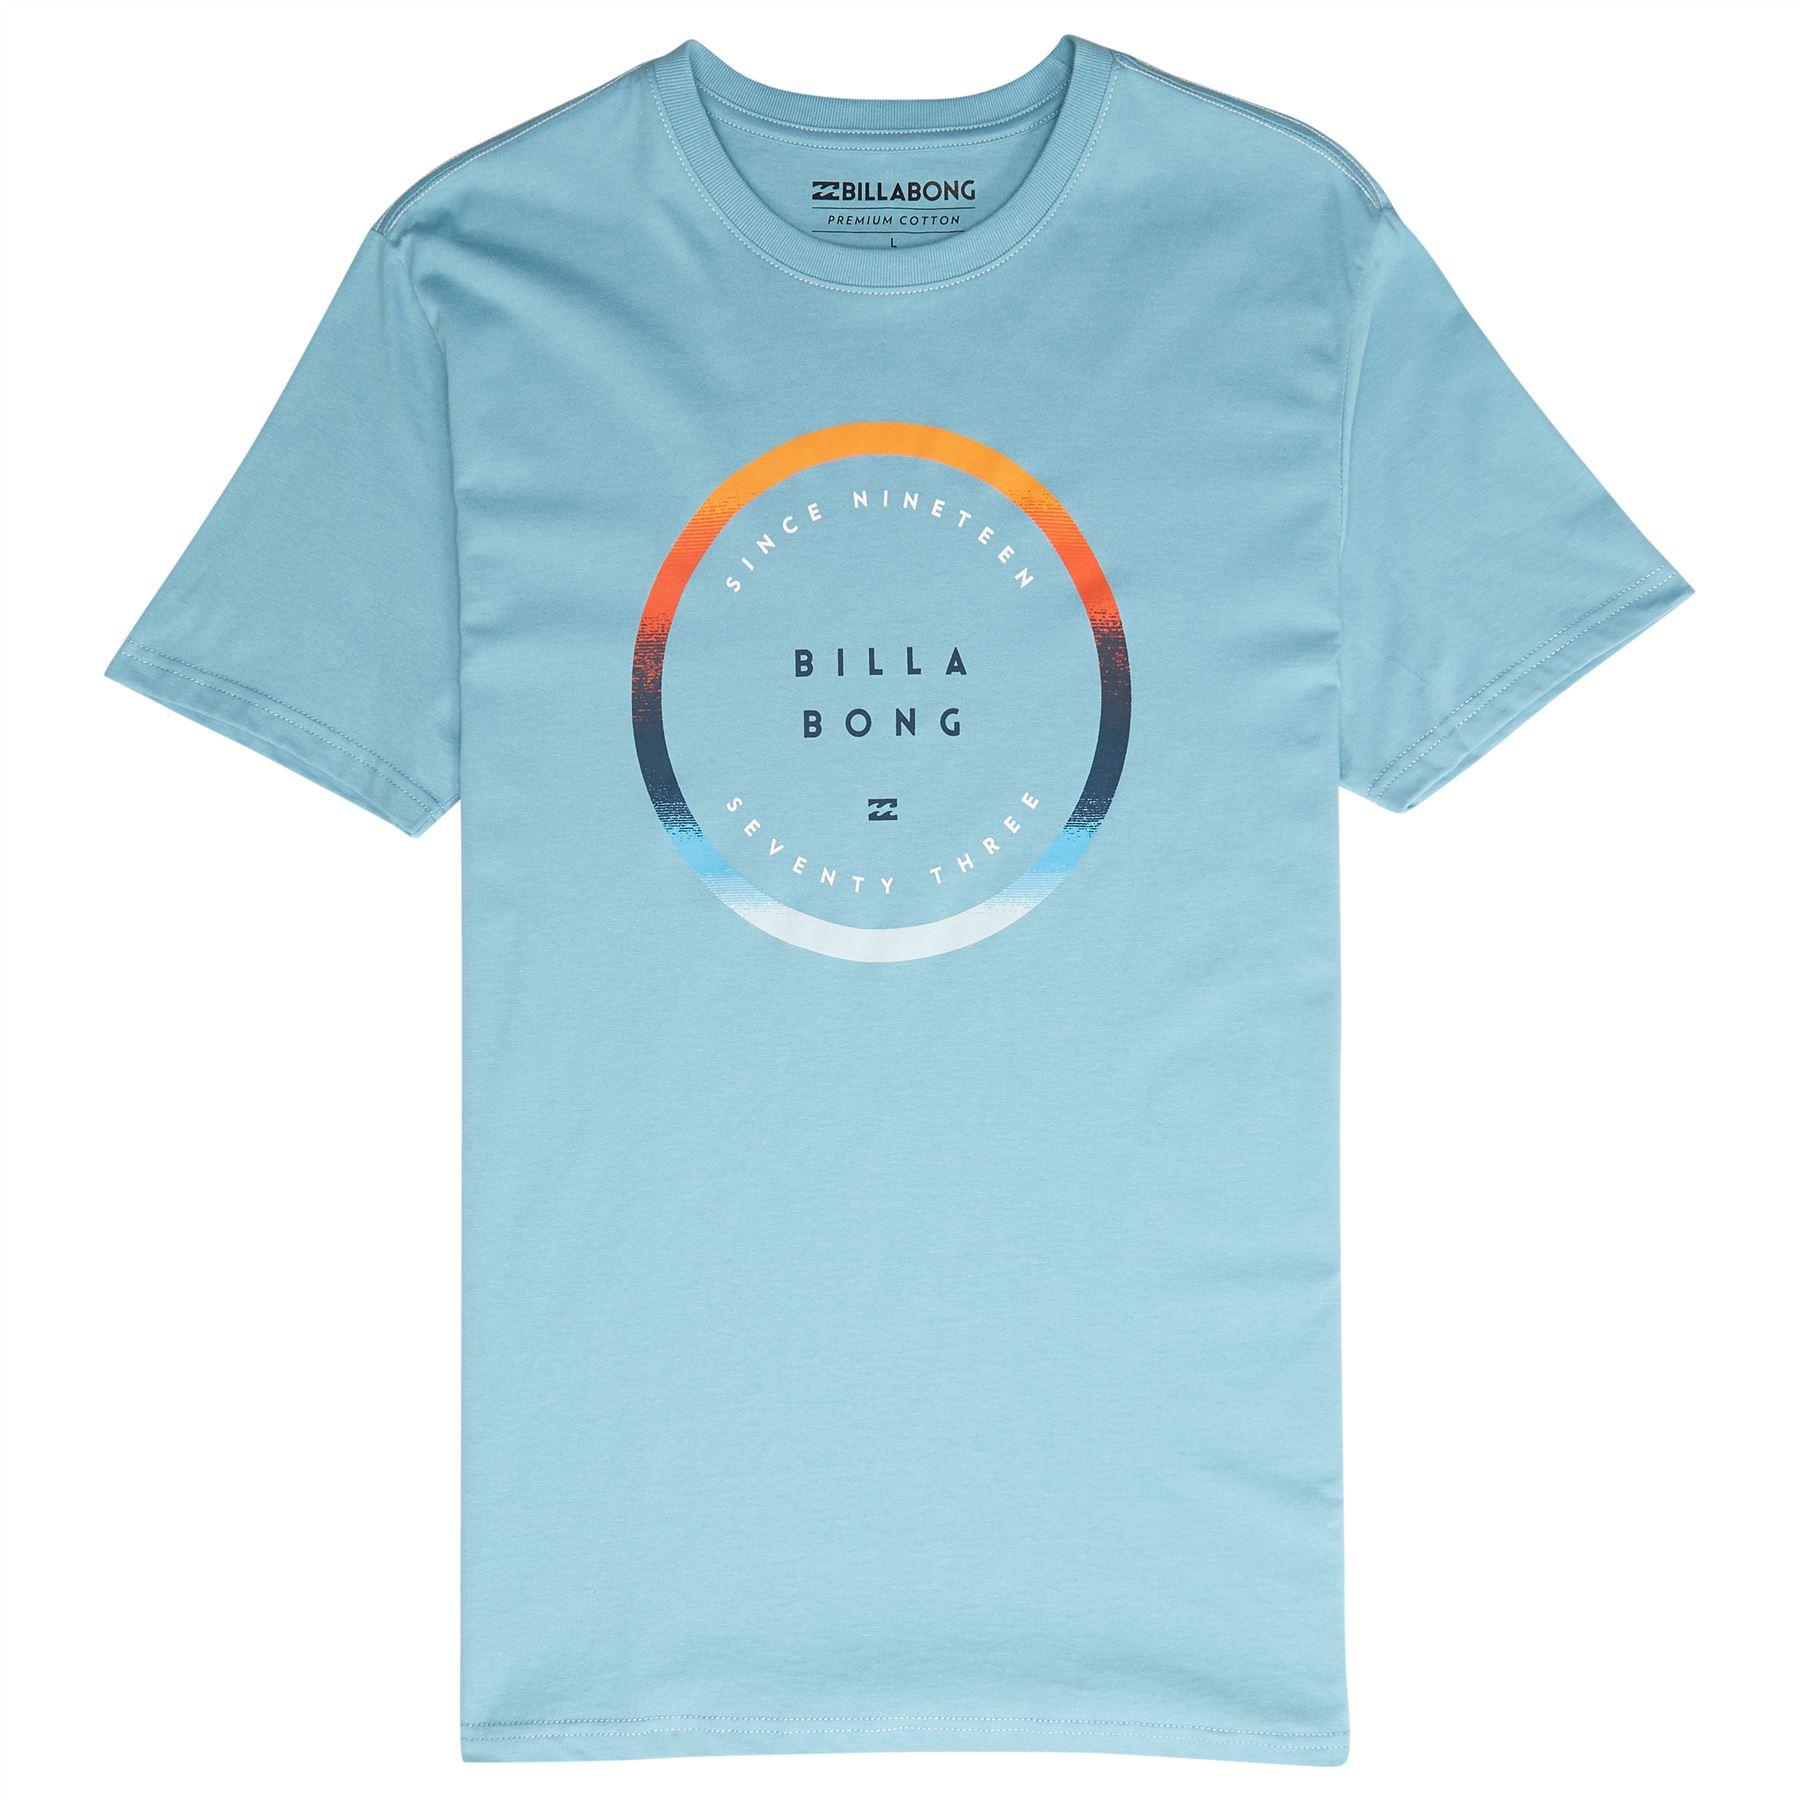 Billabong T-Shirt ~ Rotated   eBay